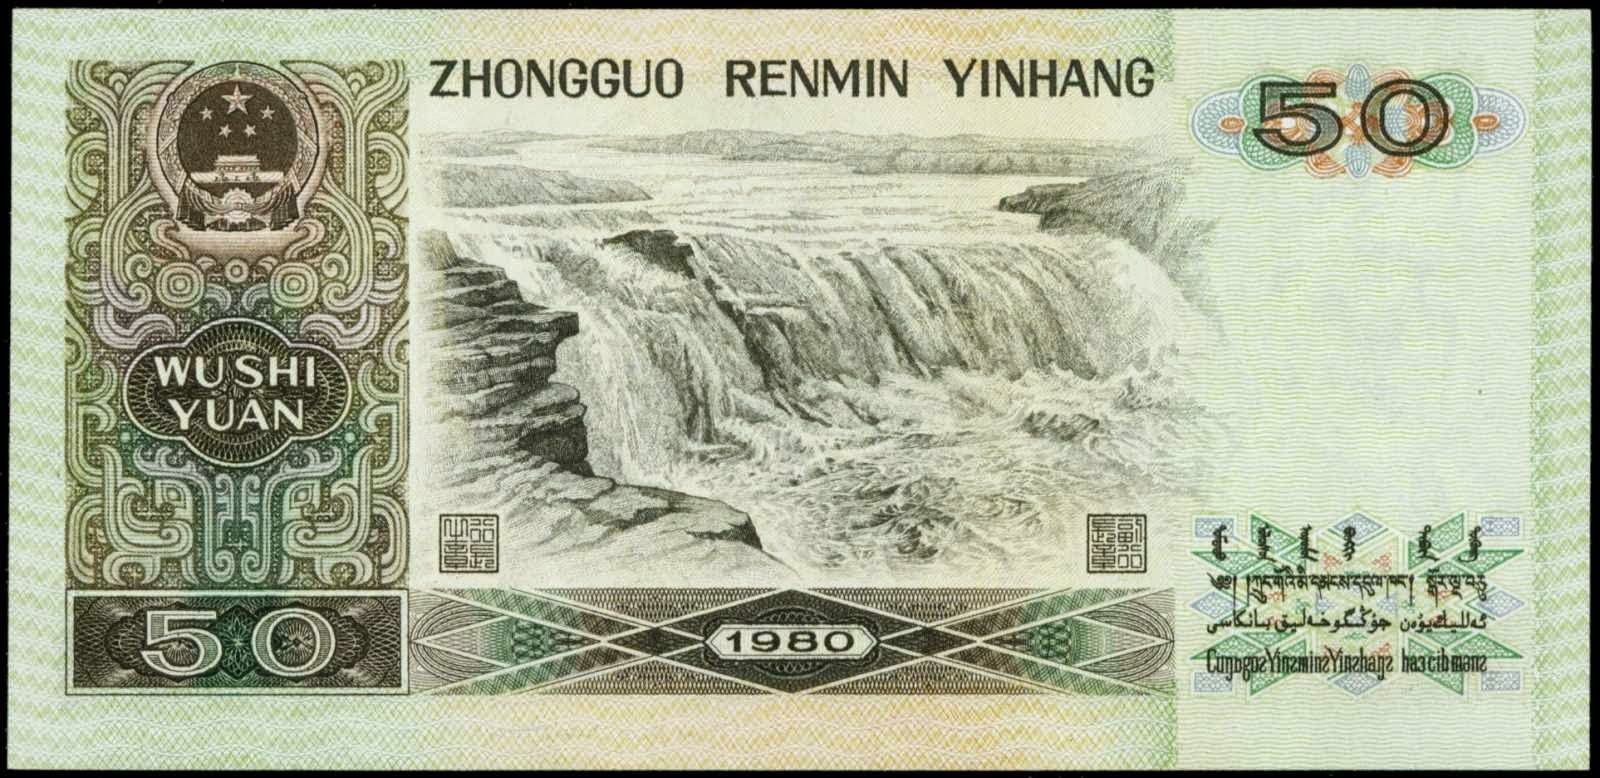 China currency 50 Yuan Renminbi banknote 1980